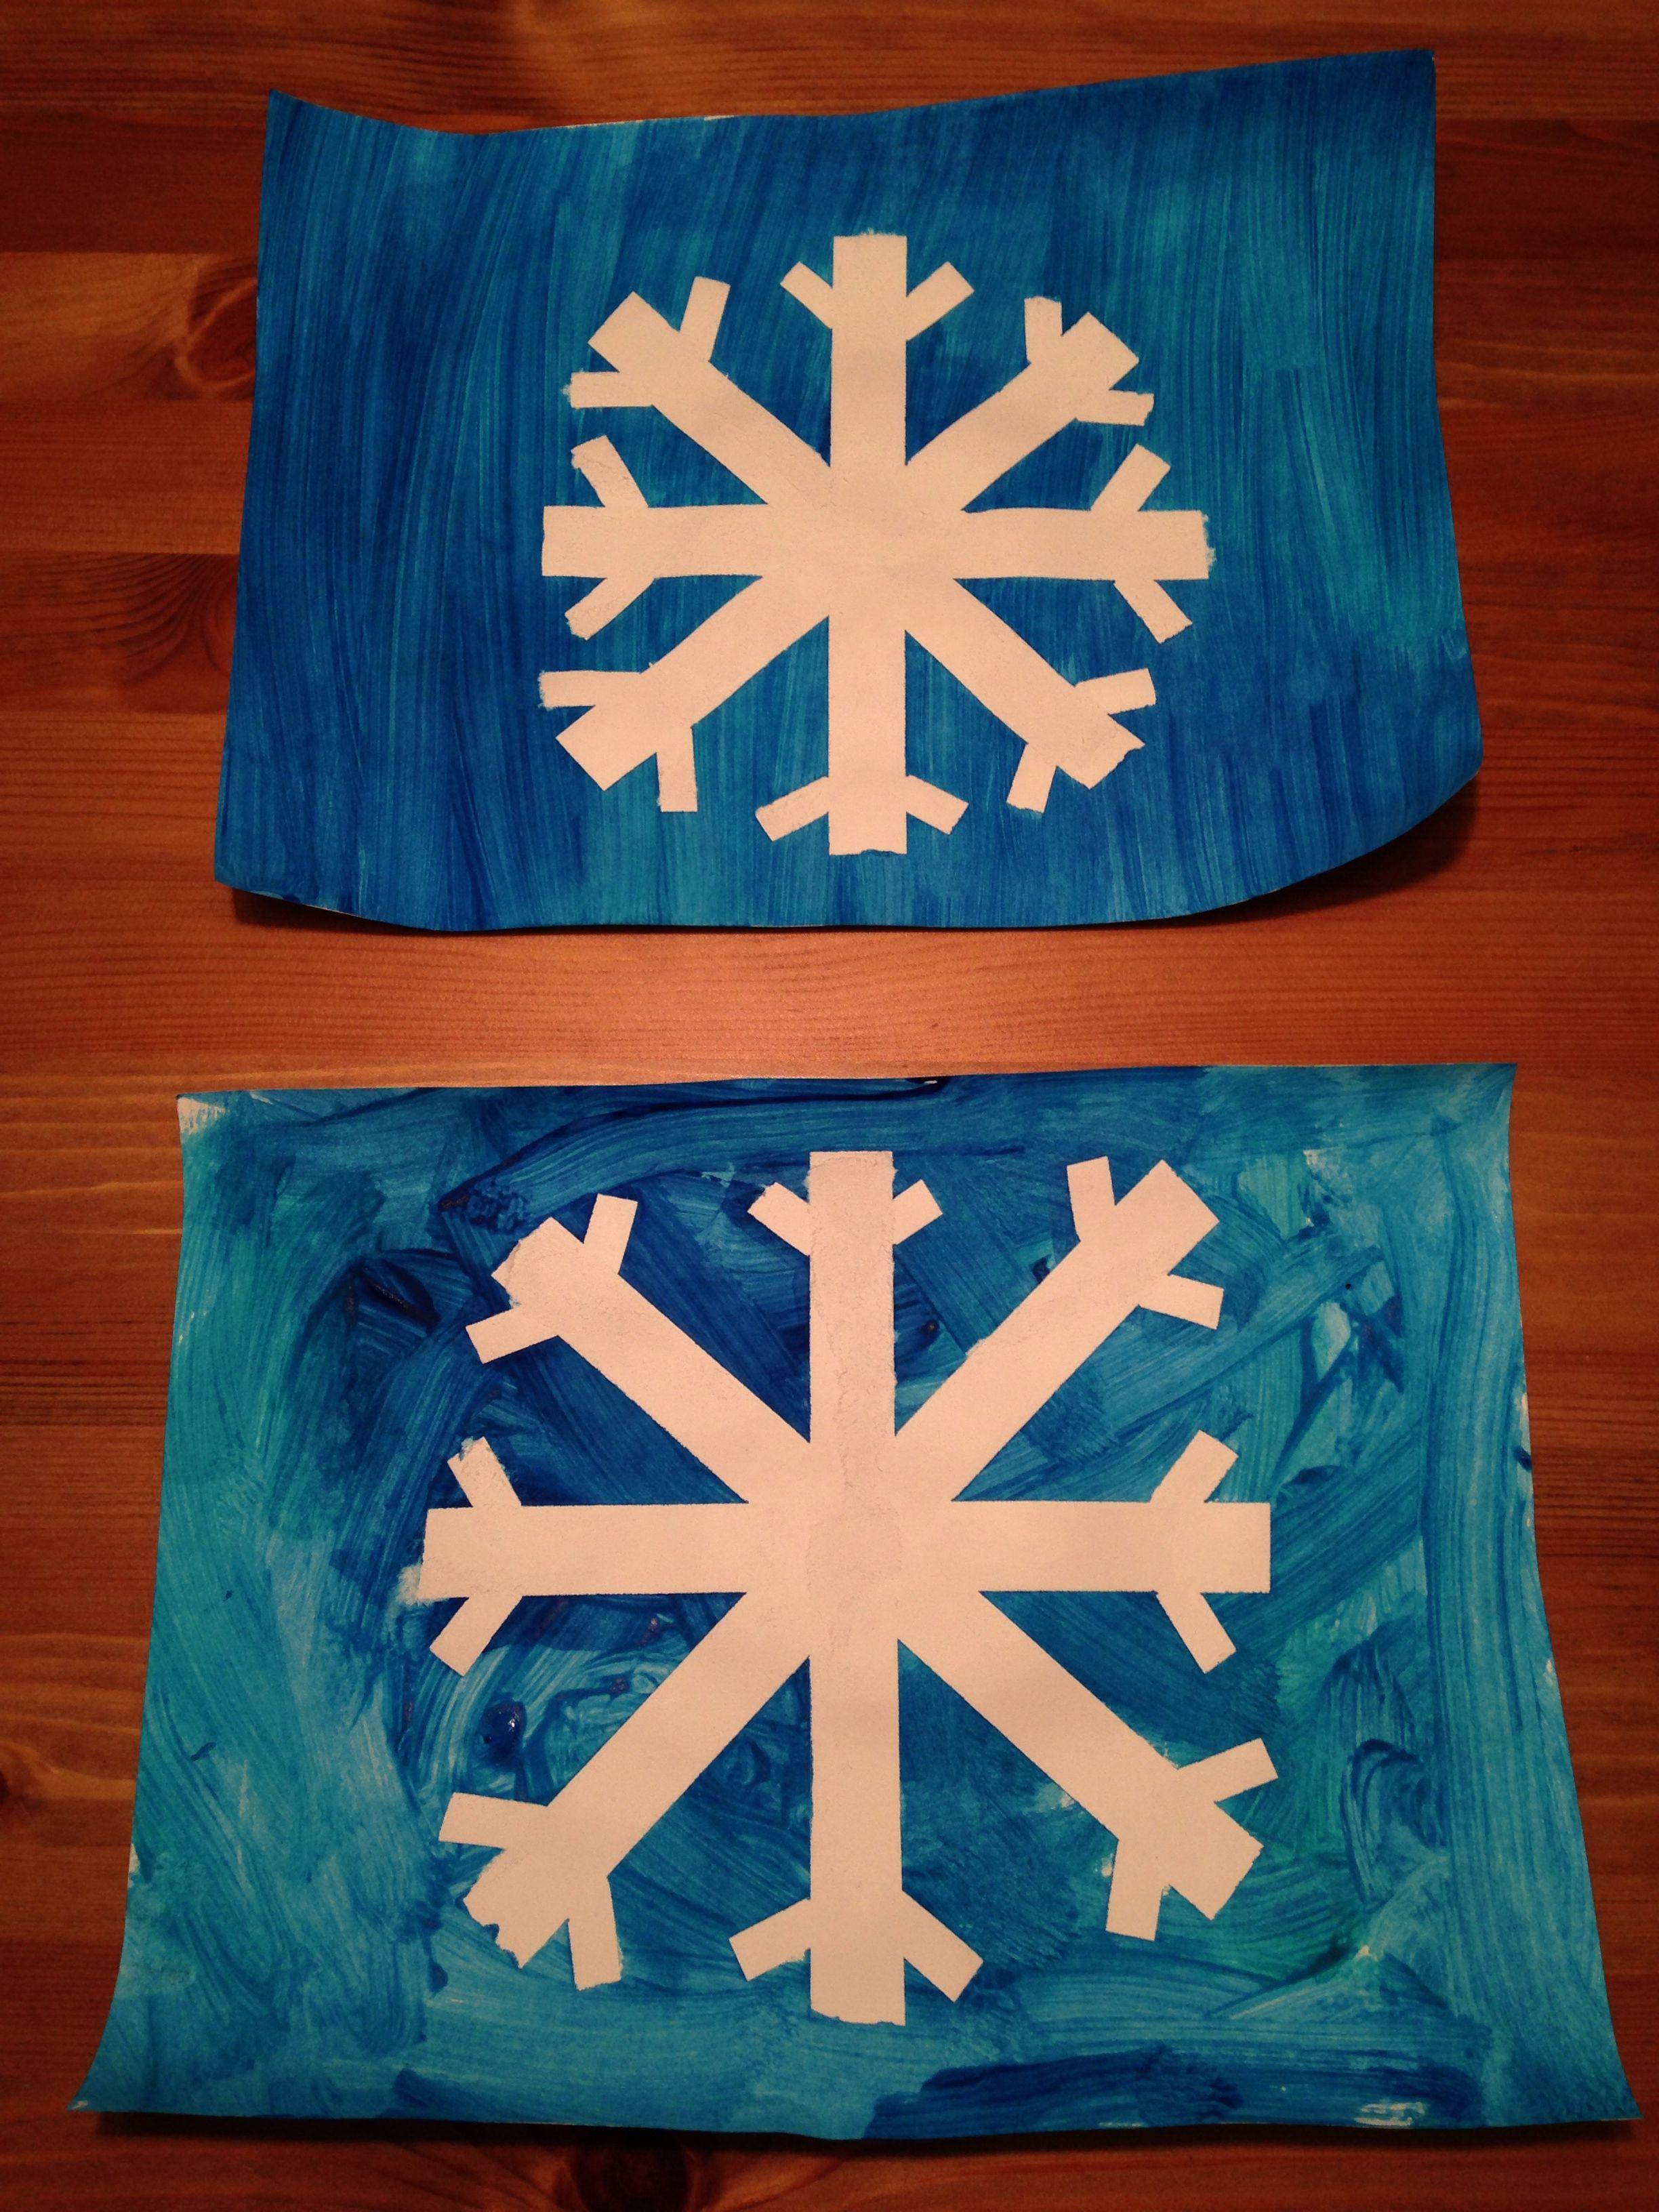 Tape Resist Snowflake Craft